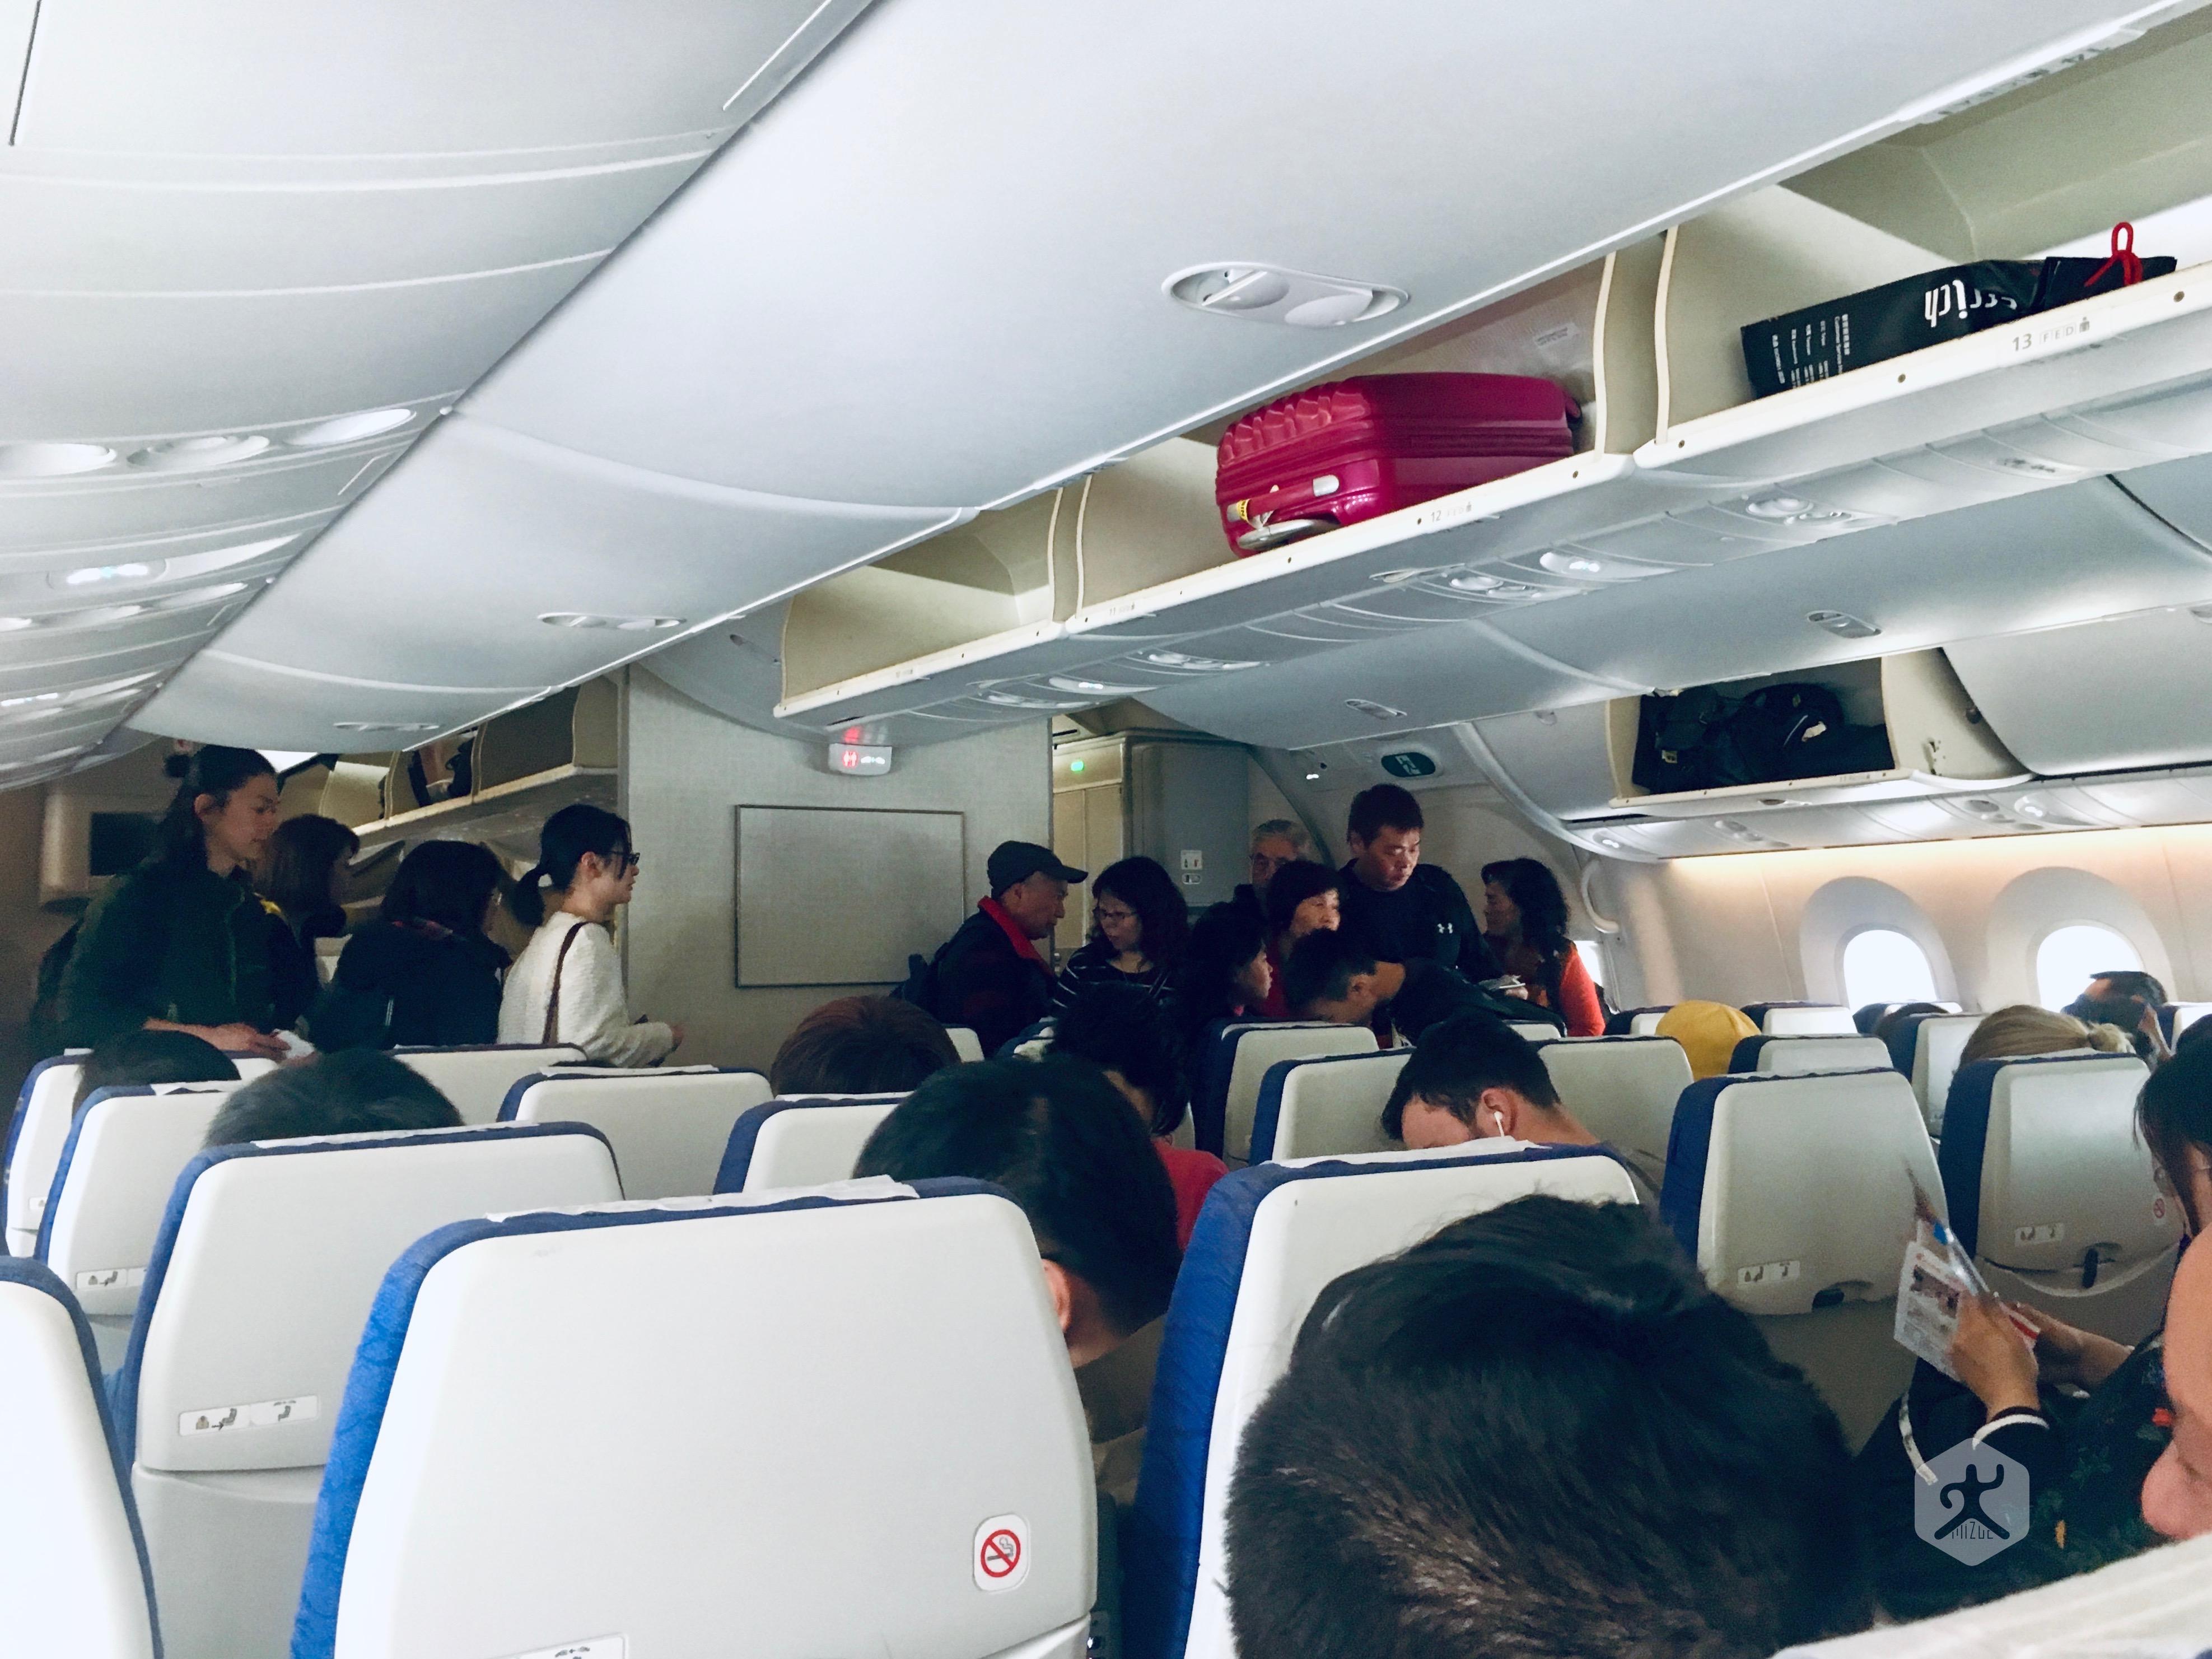 Scoot Aviation Cabin Seat Boeing 787 201903